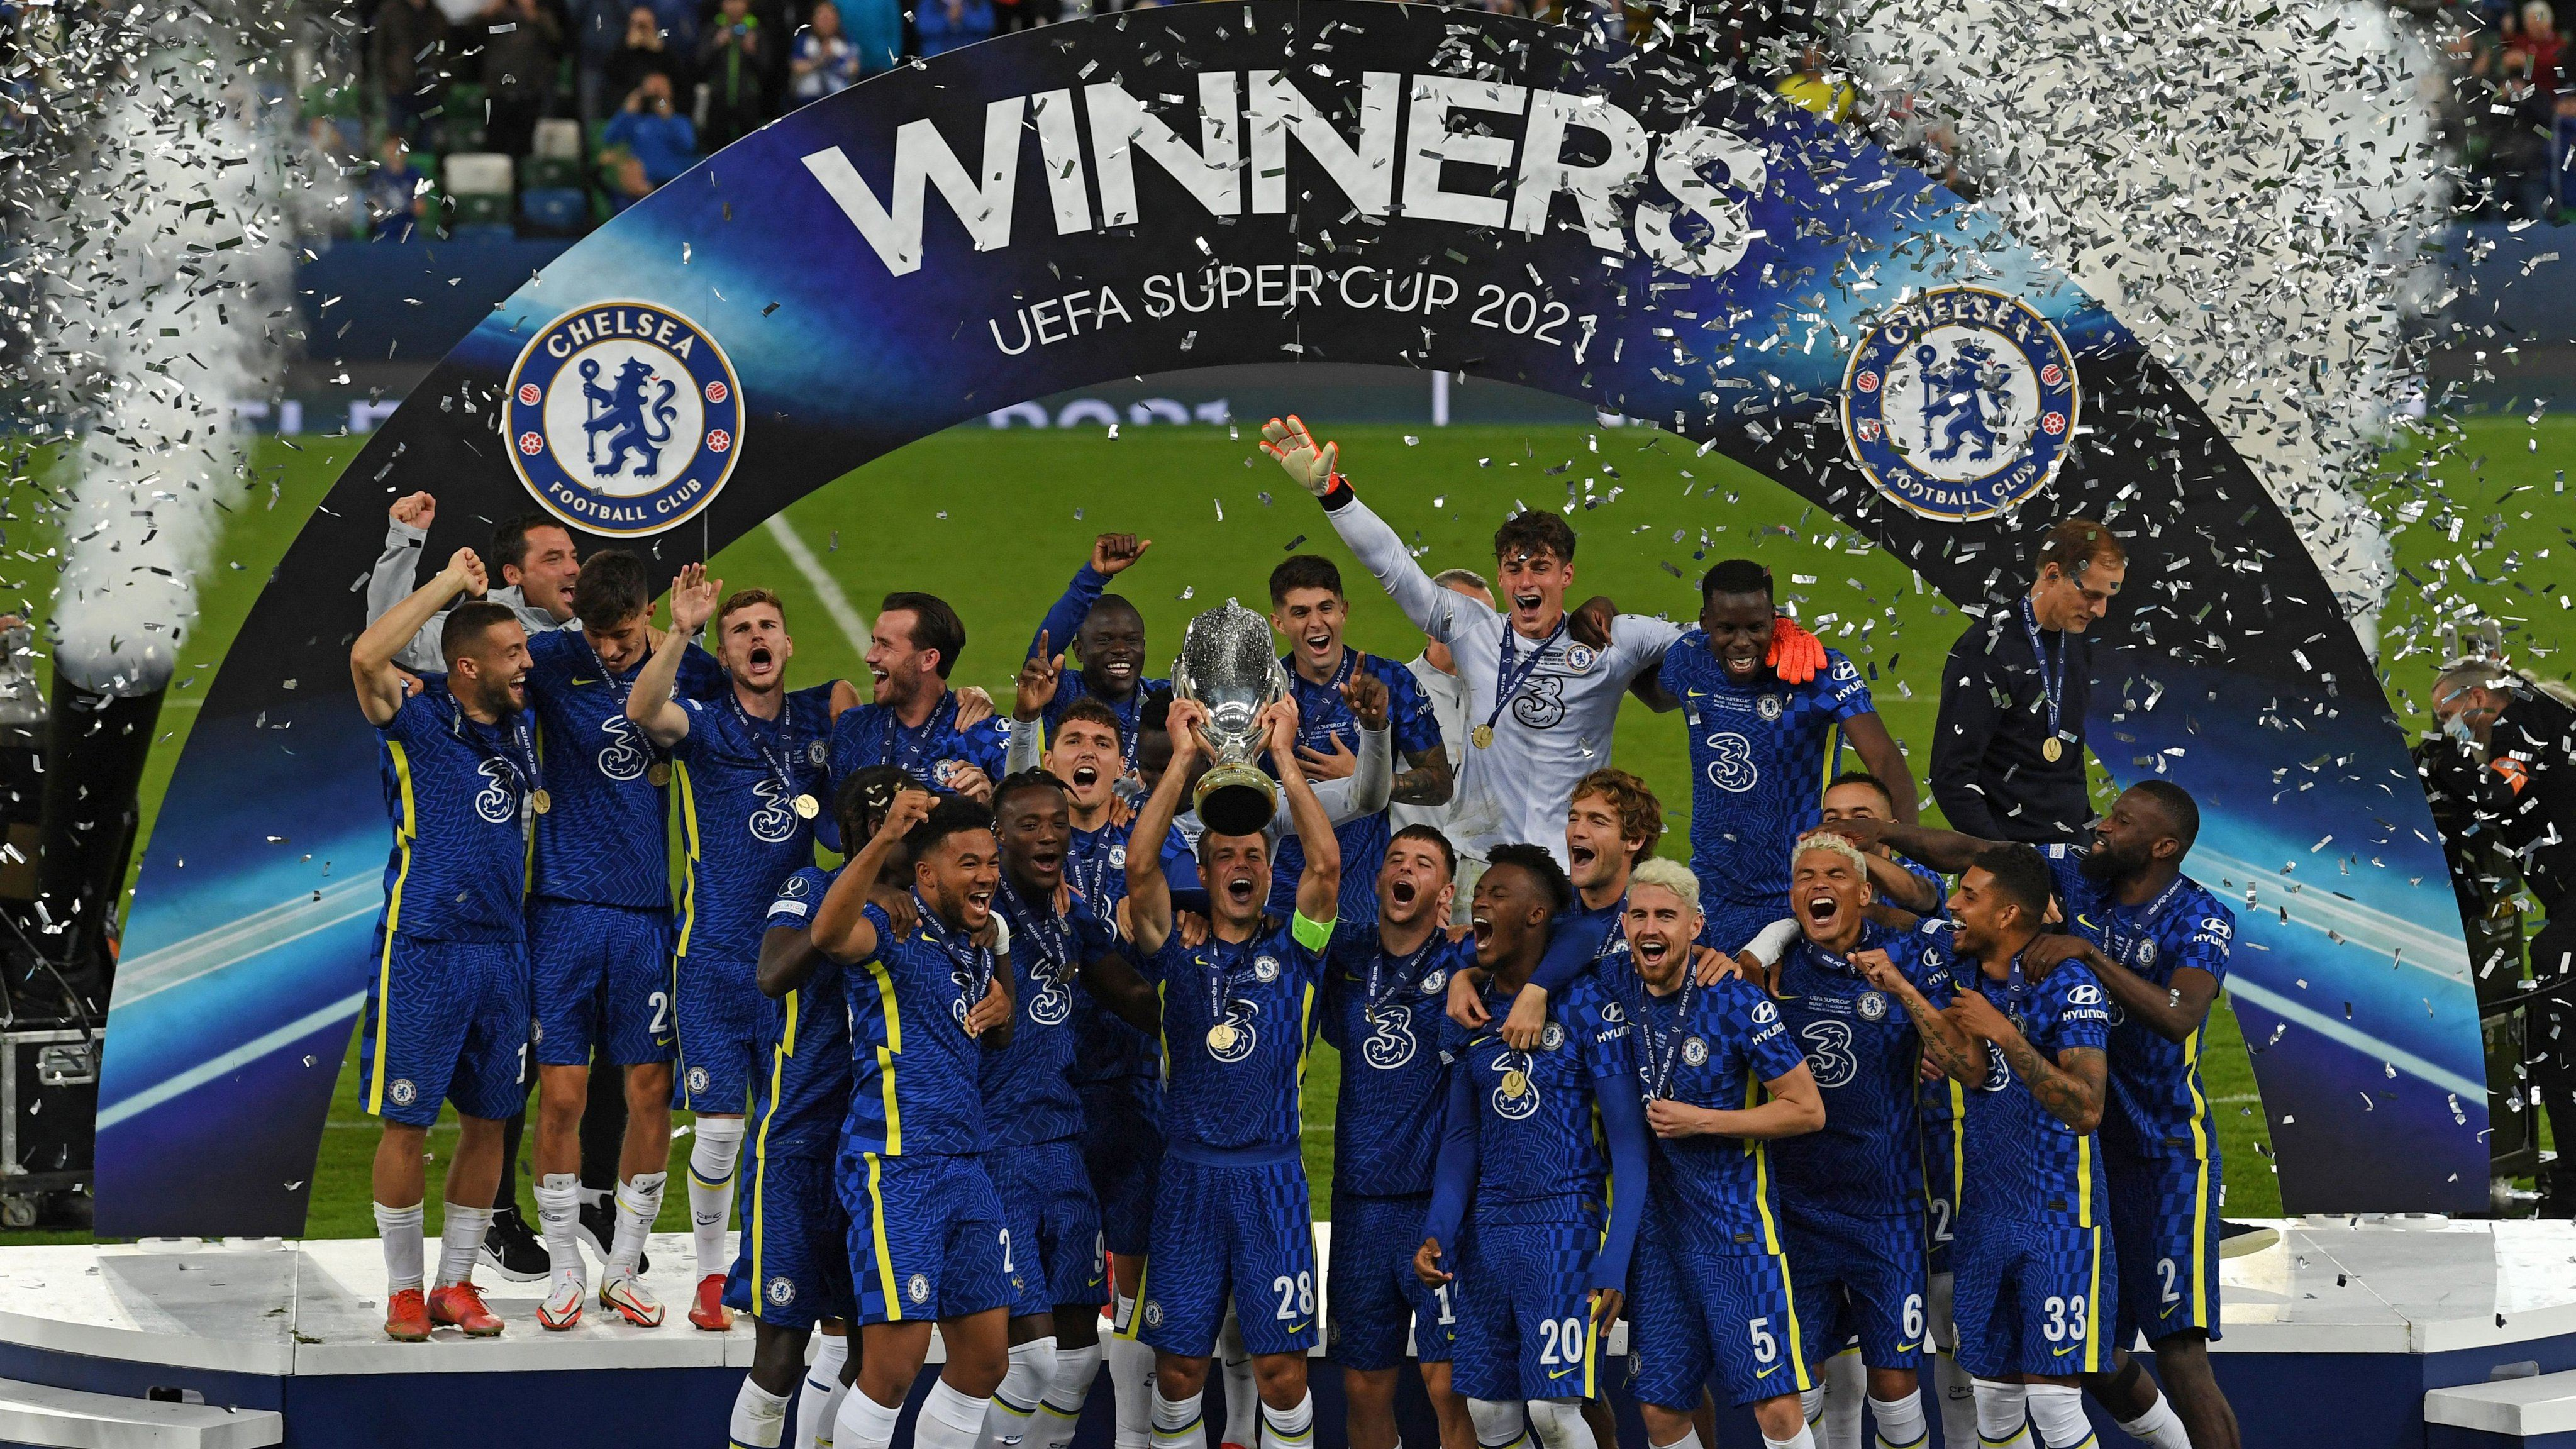 Chelsea Super Cup